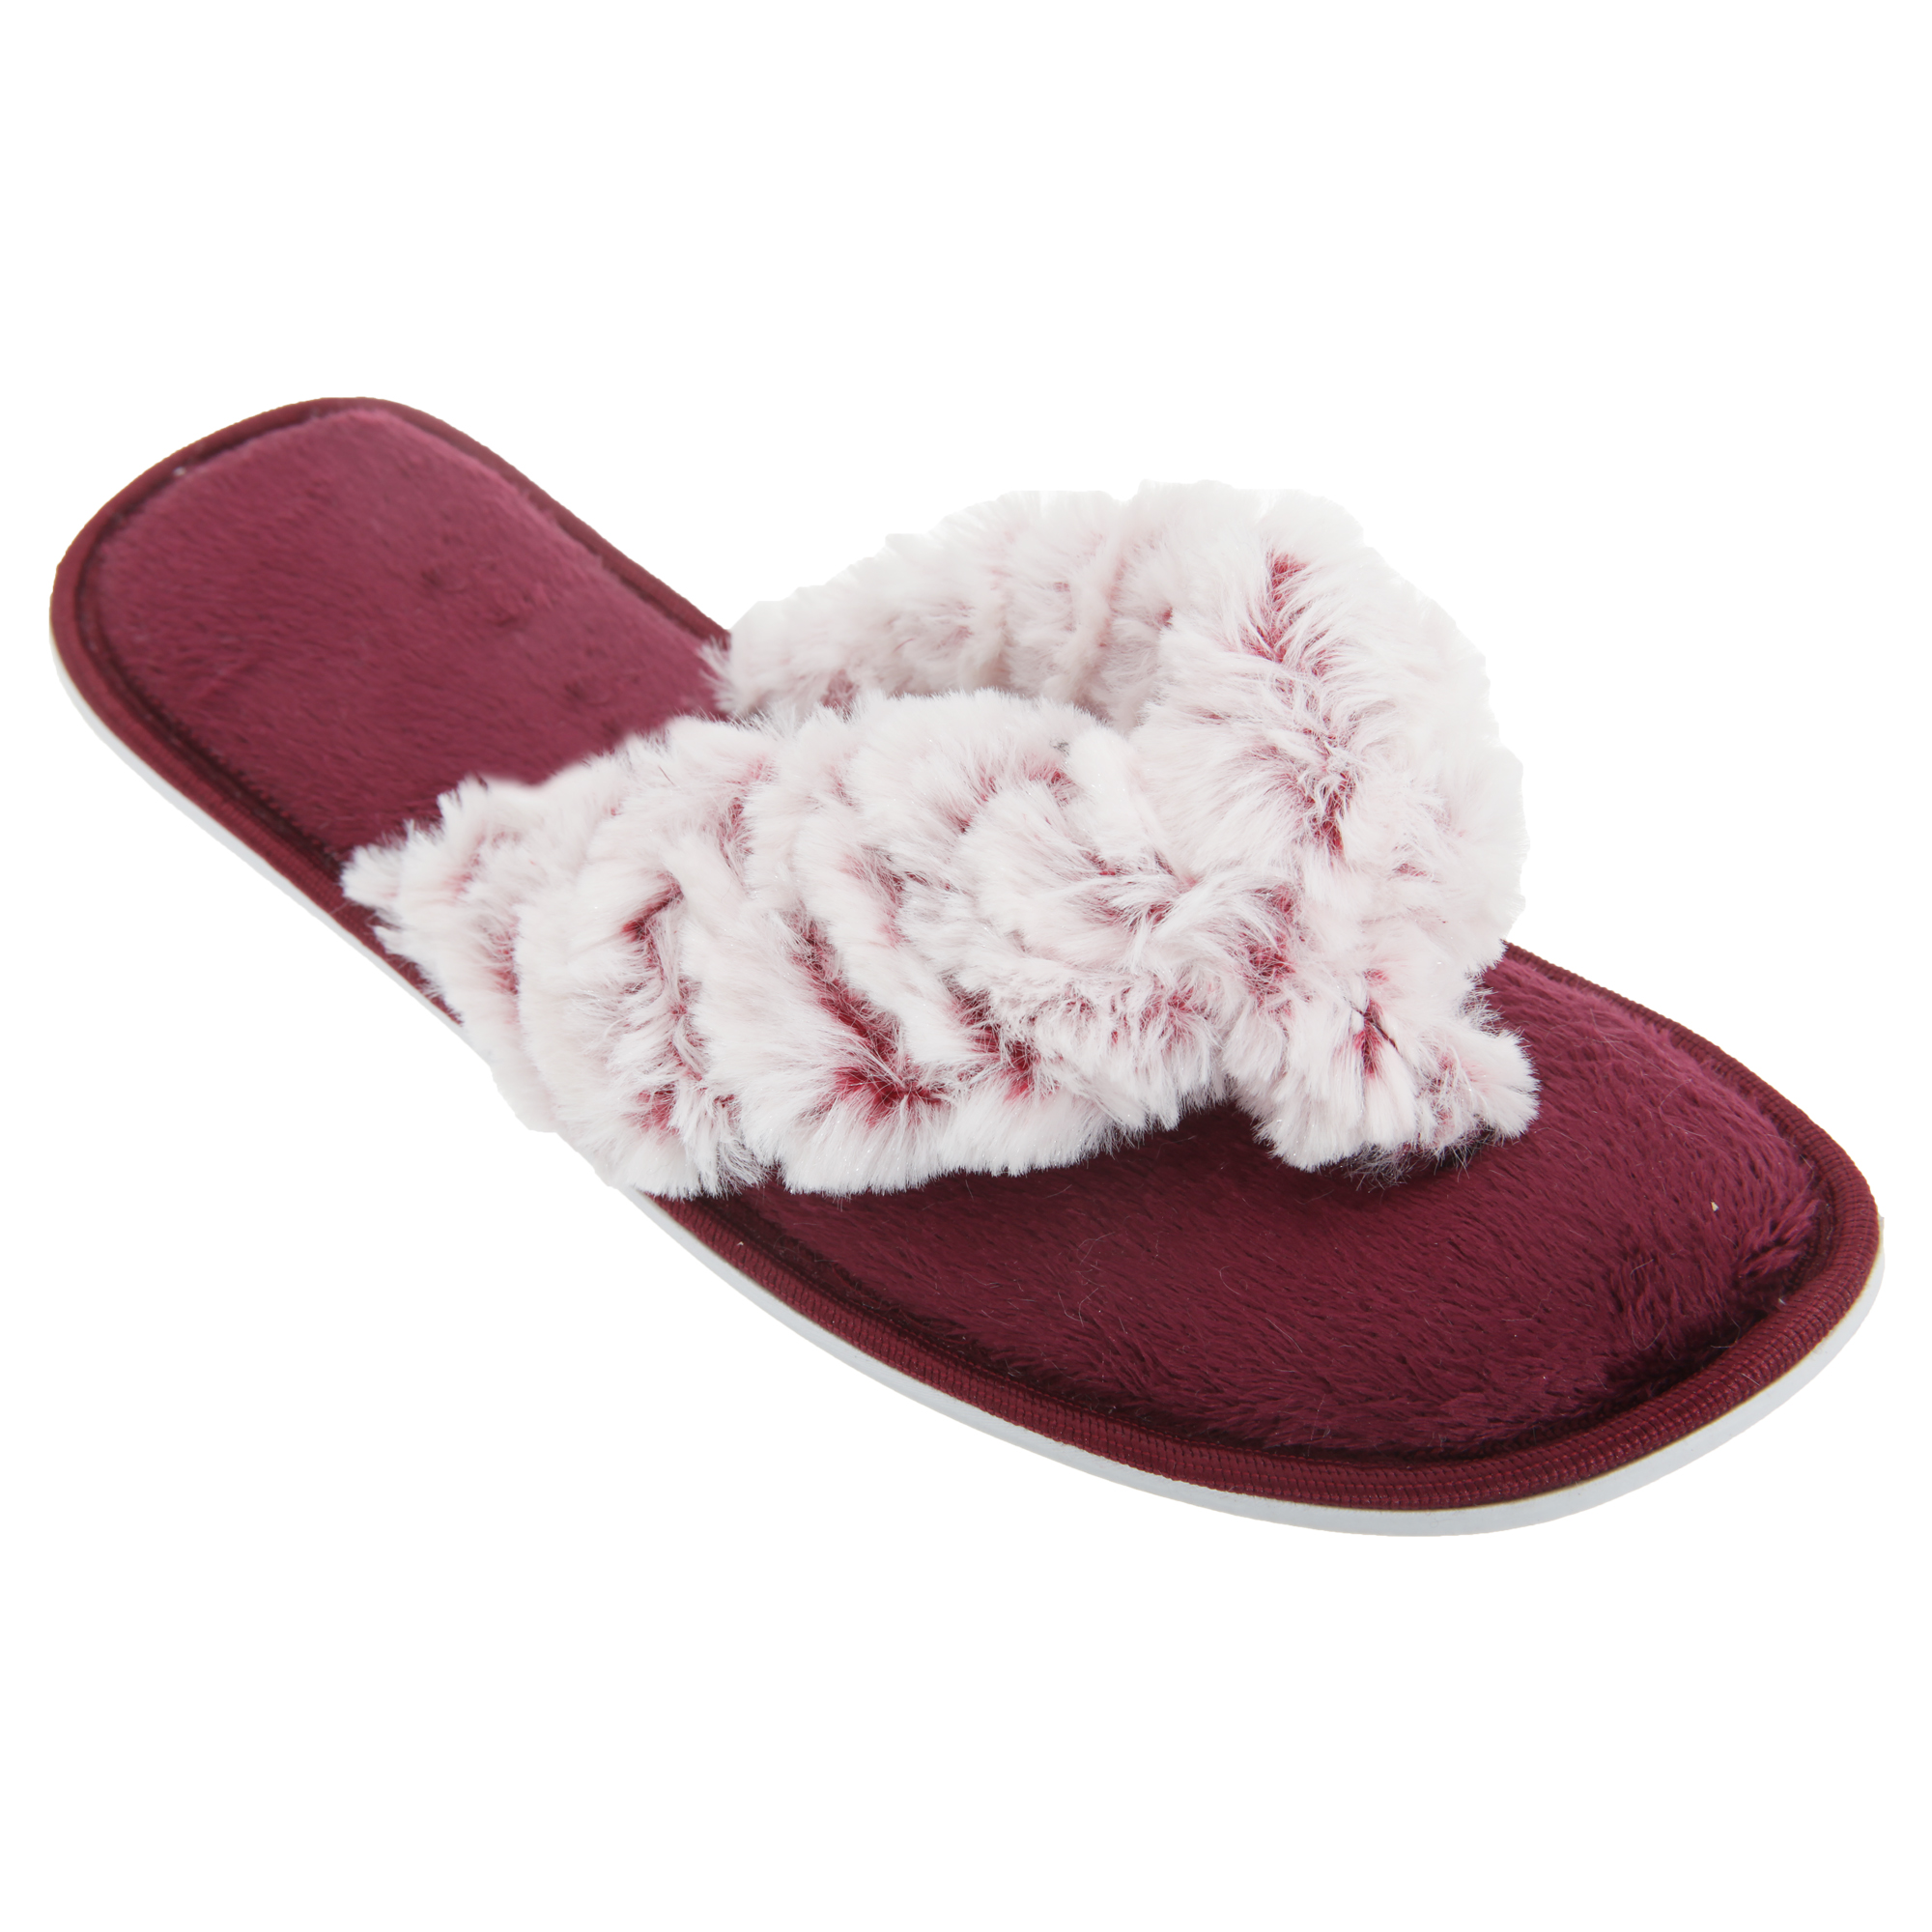 damen fleece zehentrenner flip flop hausschuhe besonders flauschig ebay. Black Bedroom Furniture Sets. Home Design Ideas